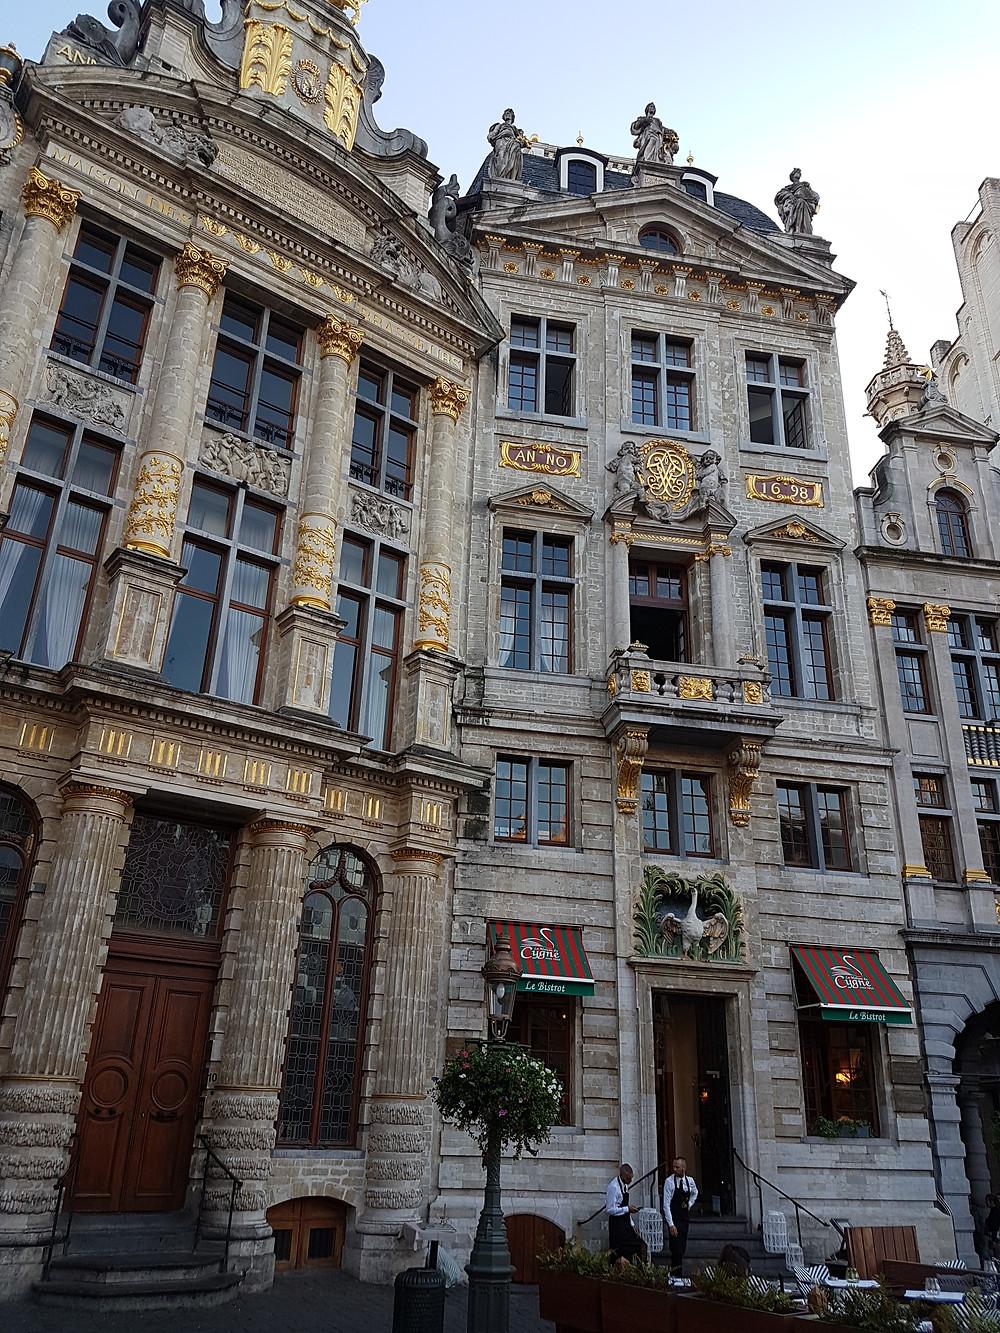 Maison Le Cygne - Grote Markt - Bruxelas